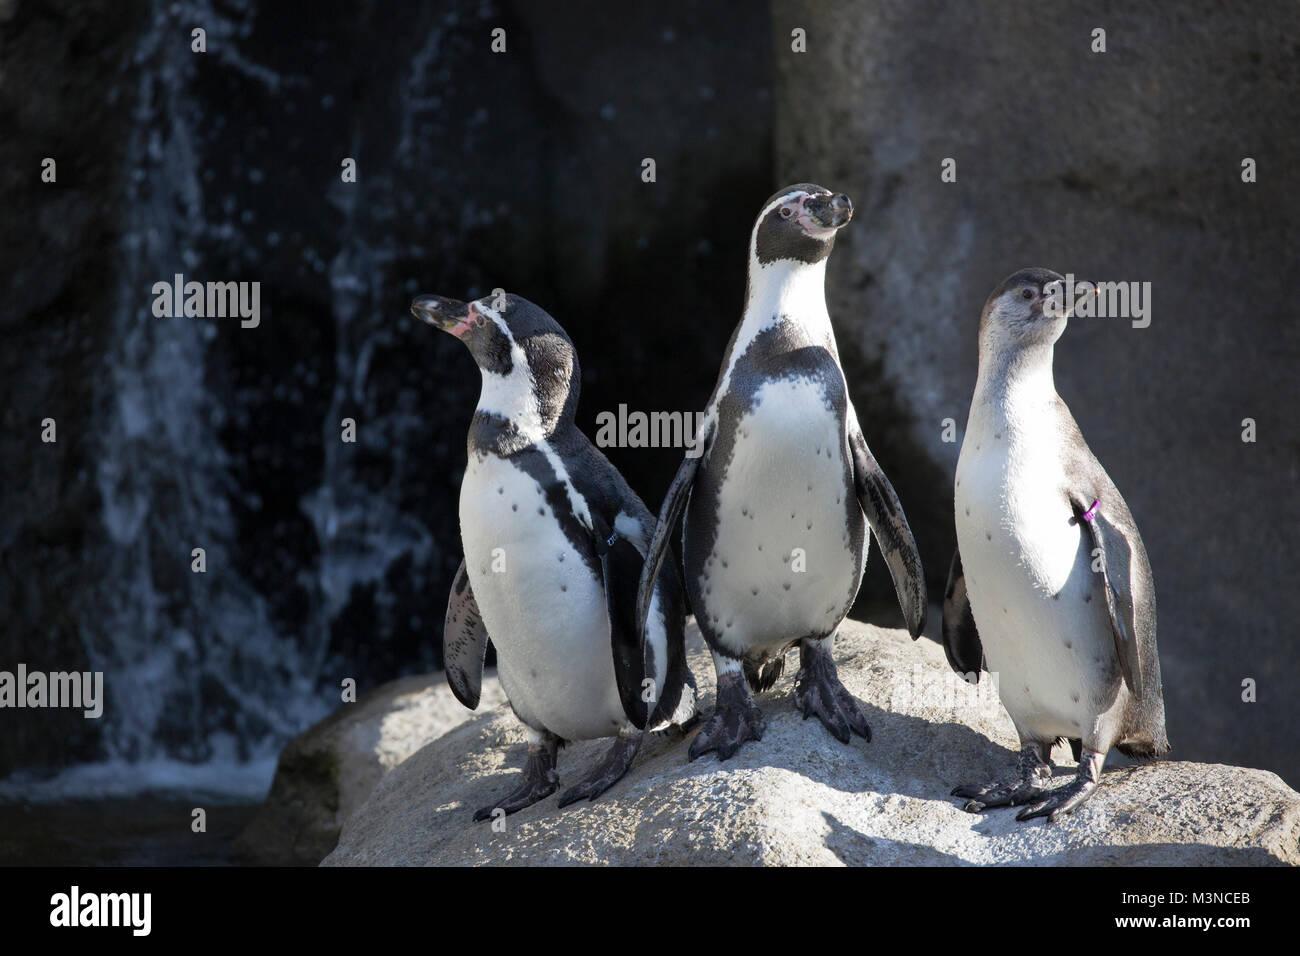 Humboldt Penguins (Spheniscus humboldti) in zoo habitat - Stock Image